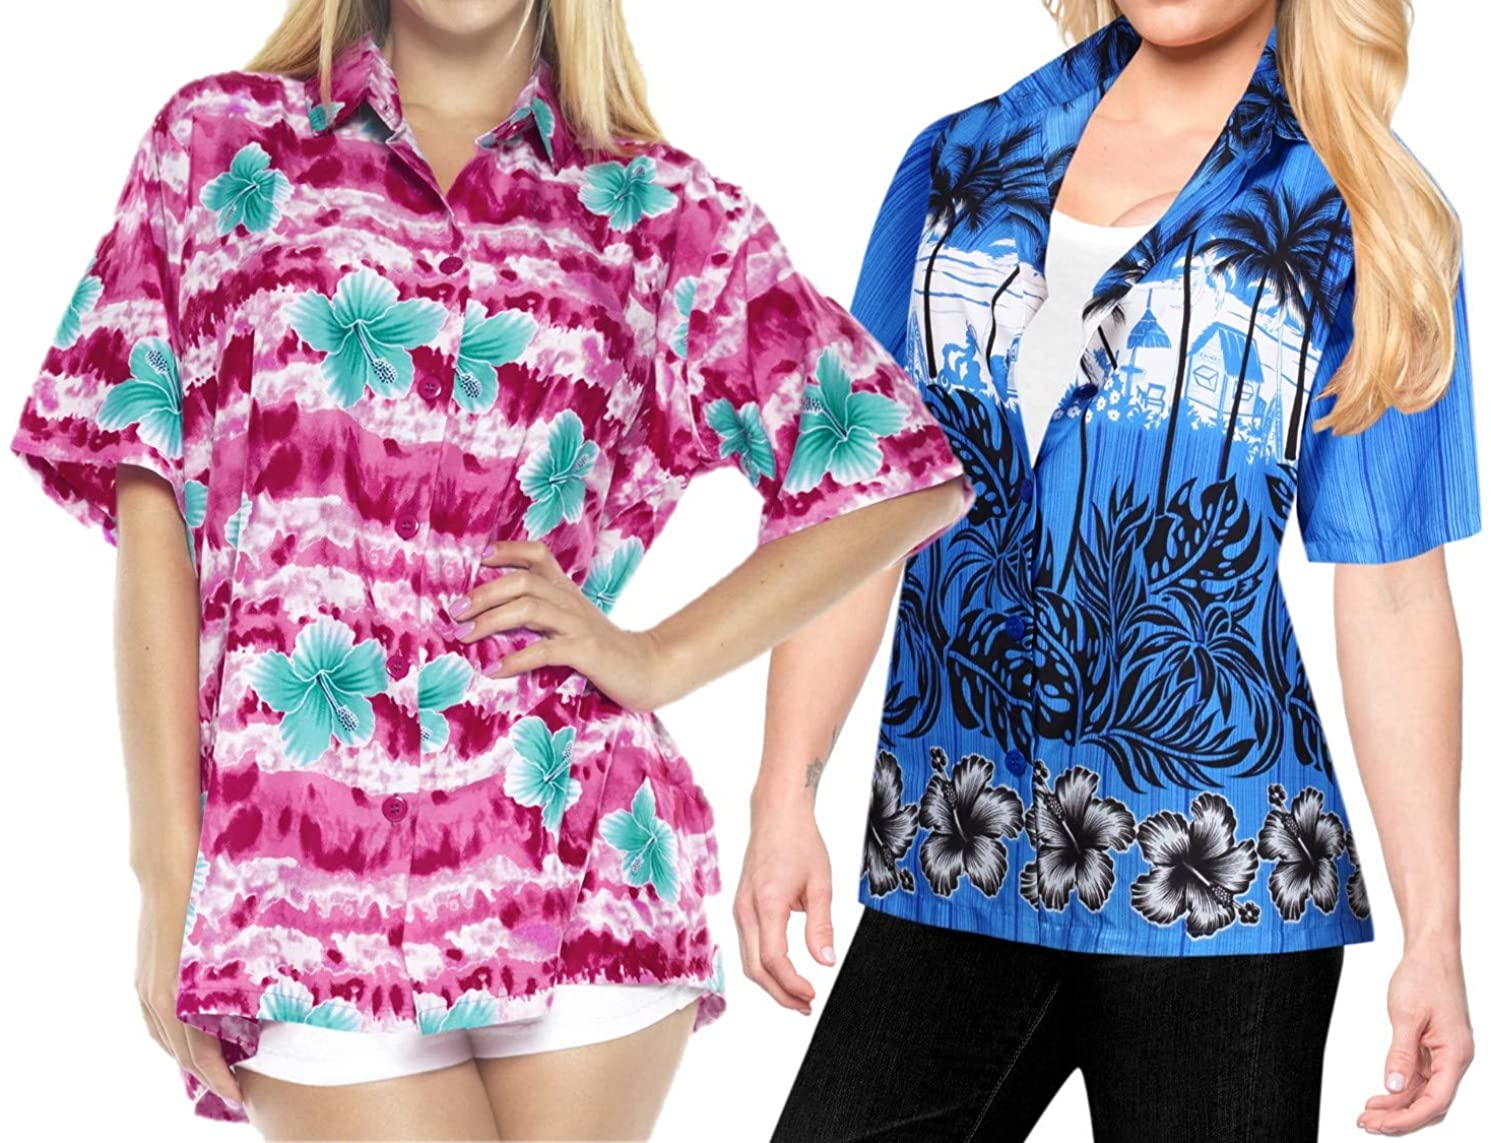 LA LEELA Women's Swim Hawaiian Shirt Beach Aloha Party Short Sleeve Work from Home Clothes Women Beach Shirt Blouse Shirt Combo Pack of 2 Size XXL